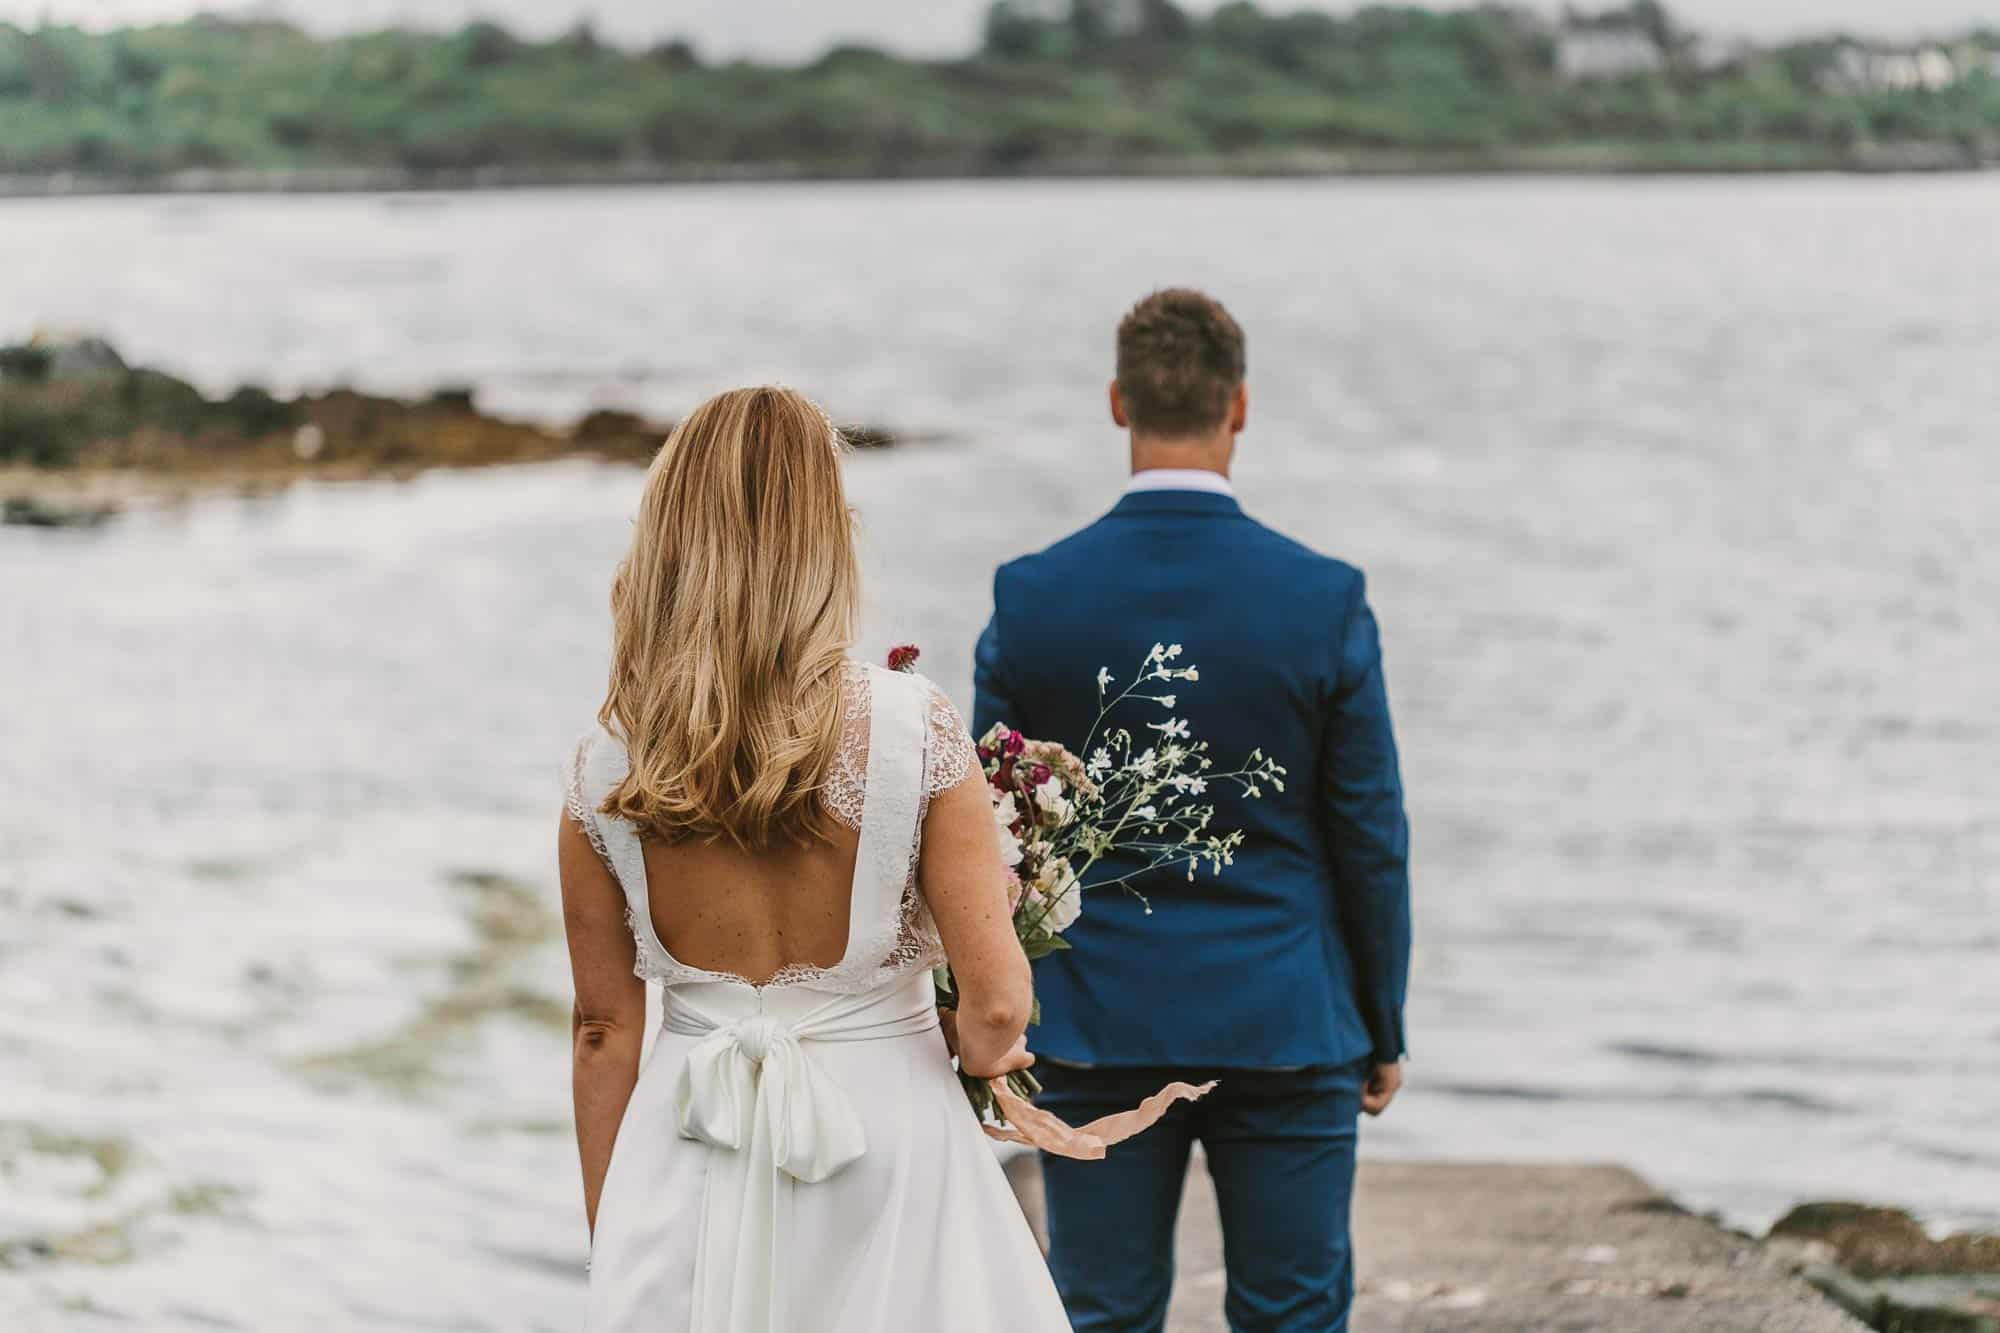 Elopement Ireland Connemara First Look on the Pier, Bride walking up to groom, at waters edge